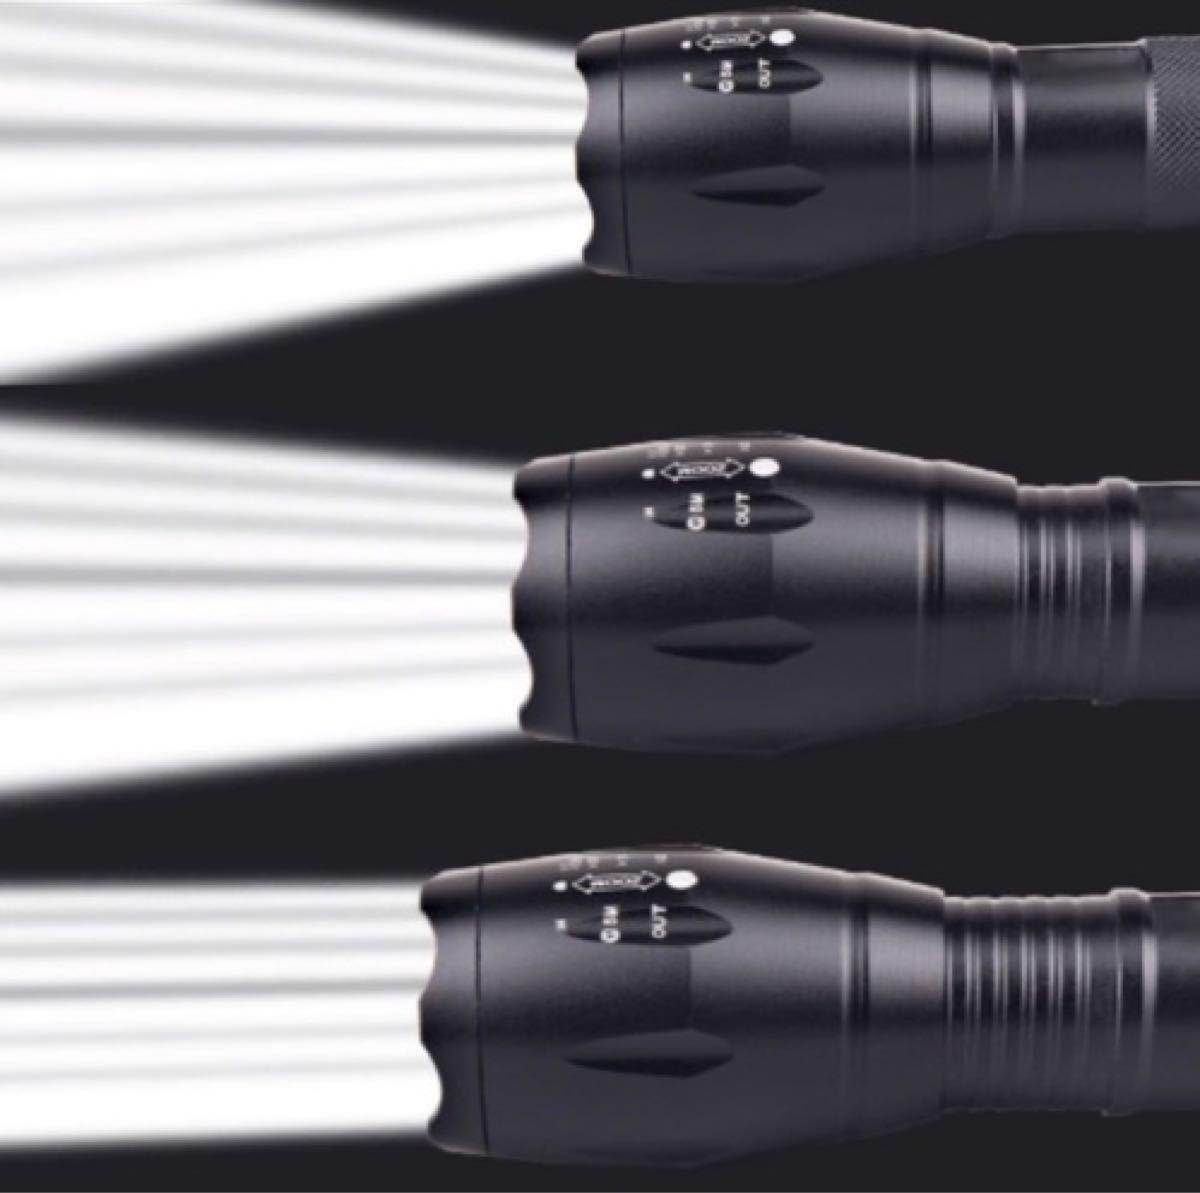 USBケーブル付き☆懐中電灯 led USB充電式 強力充電 防水 携帯